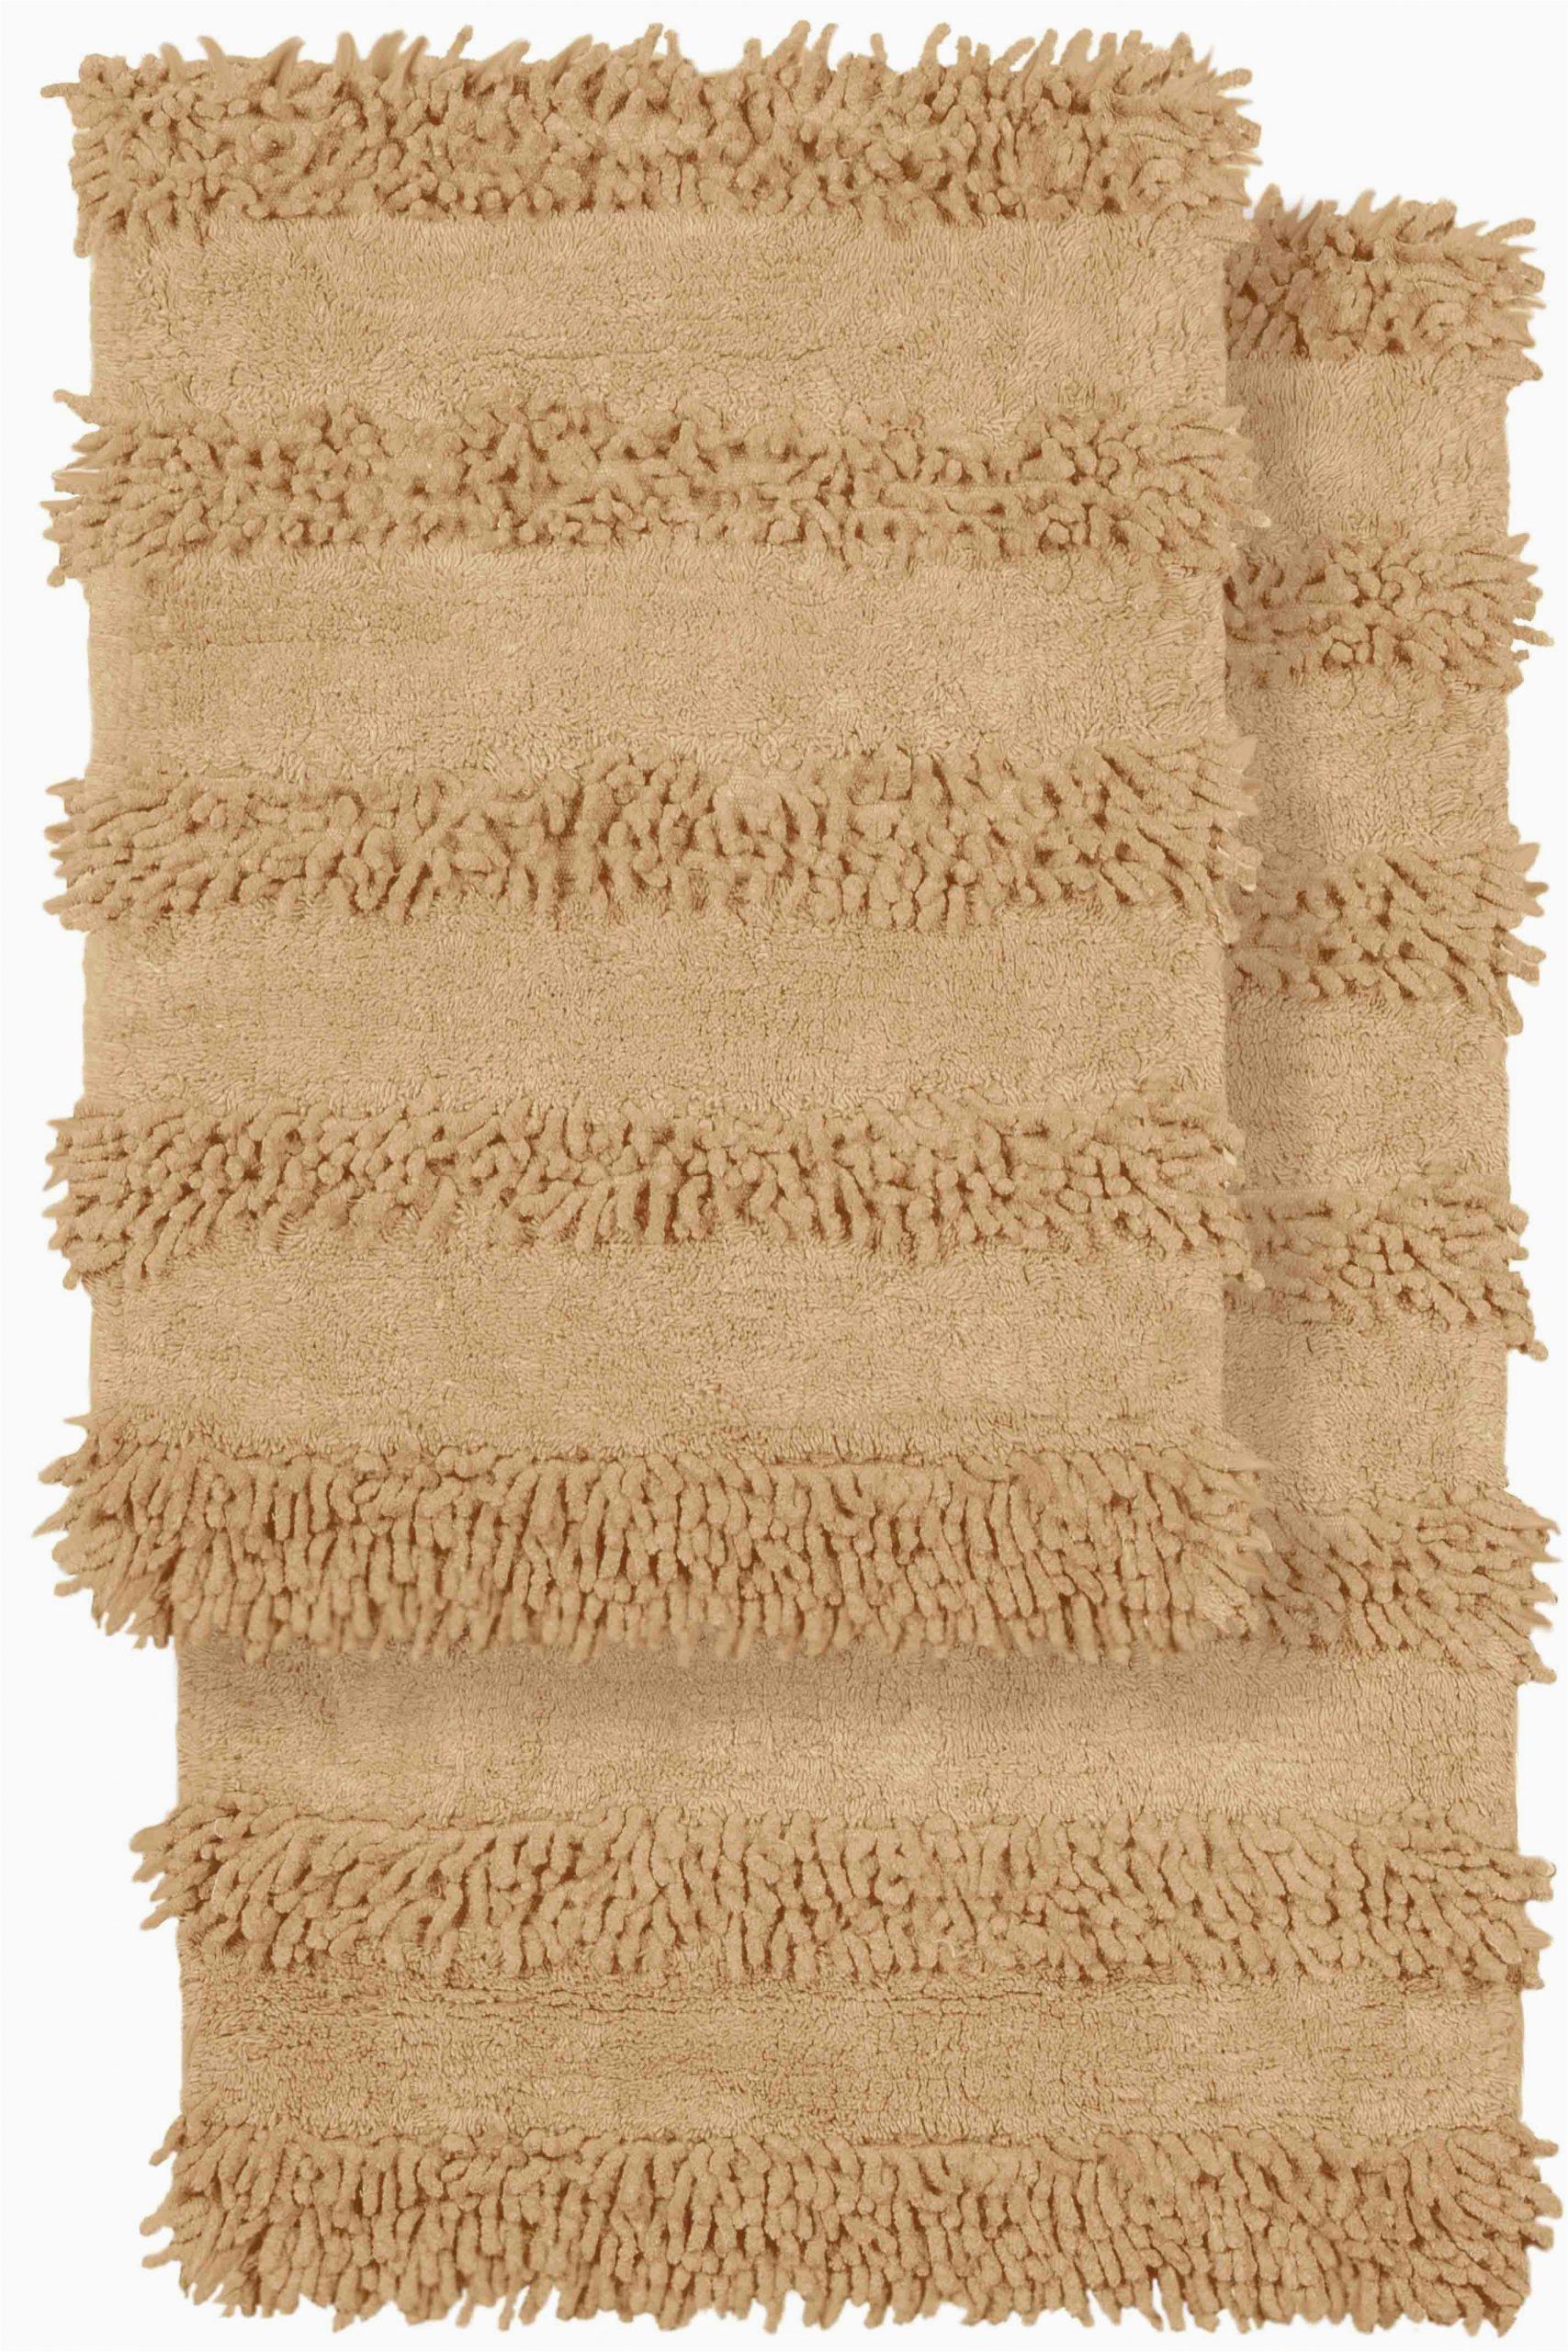 crover 2 piece modern cotton chenille solid bath mat rug set crvr1045